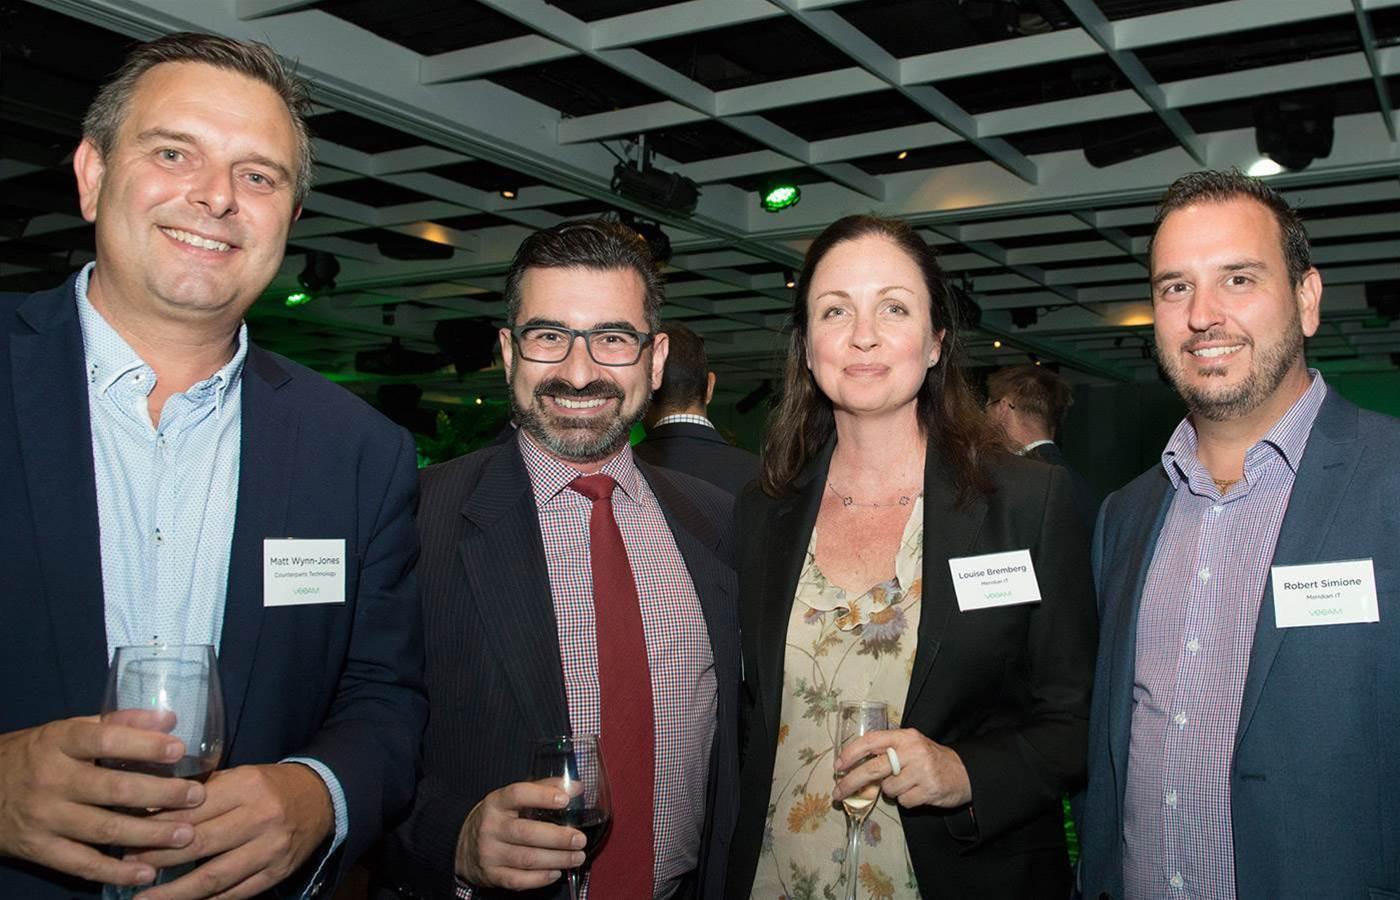 Australian Veeam partners celebrate year of growth at ProPartner awards dinner